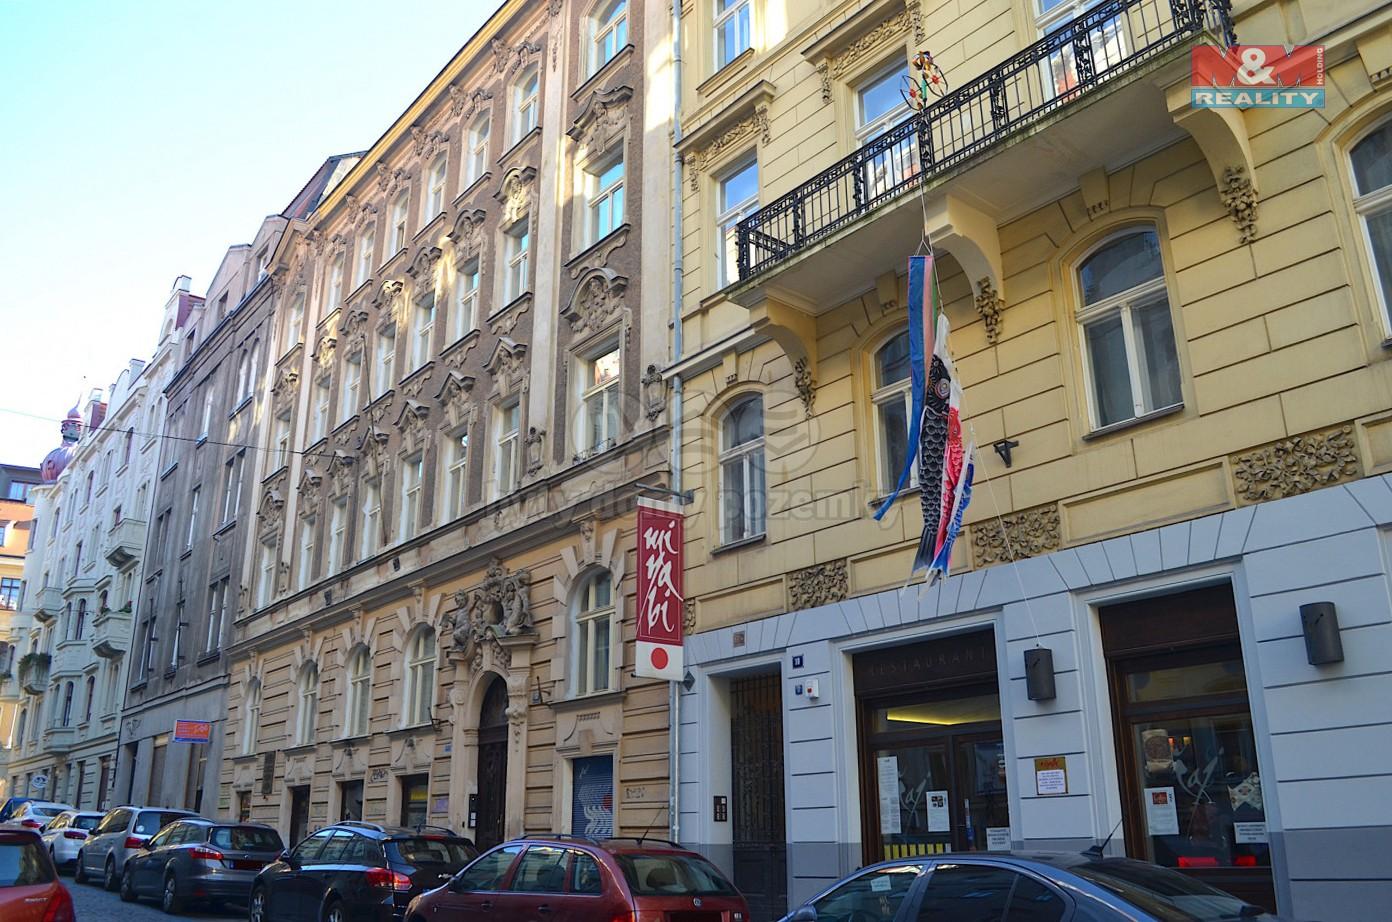 Prodej bytu 3+kk, 78 m², Praha, ul. Navrátilova